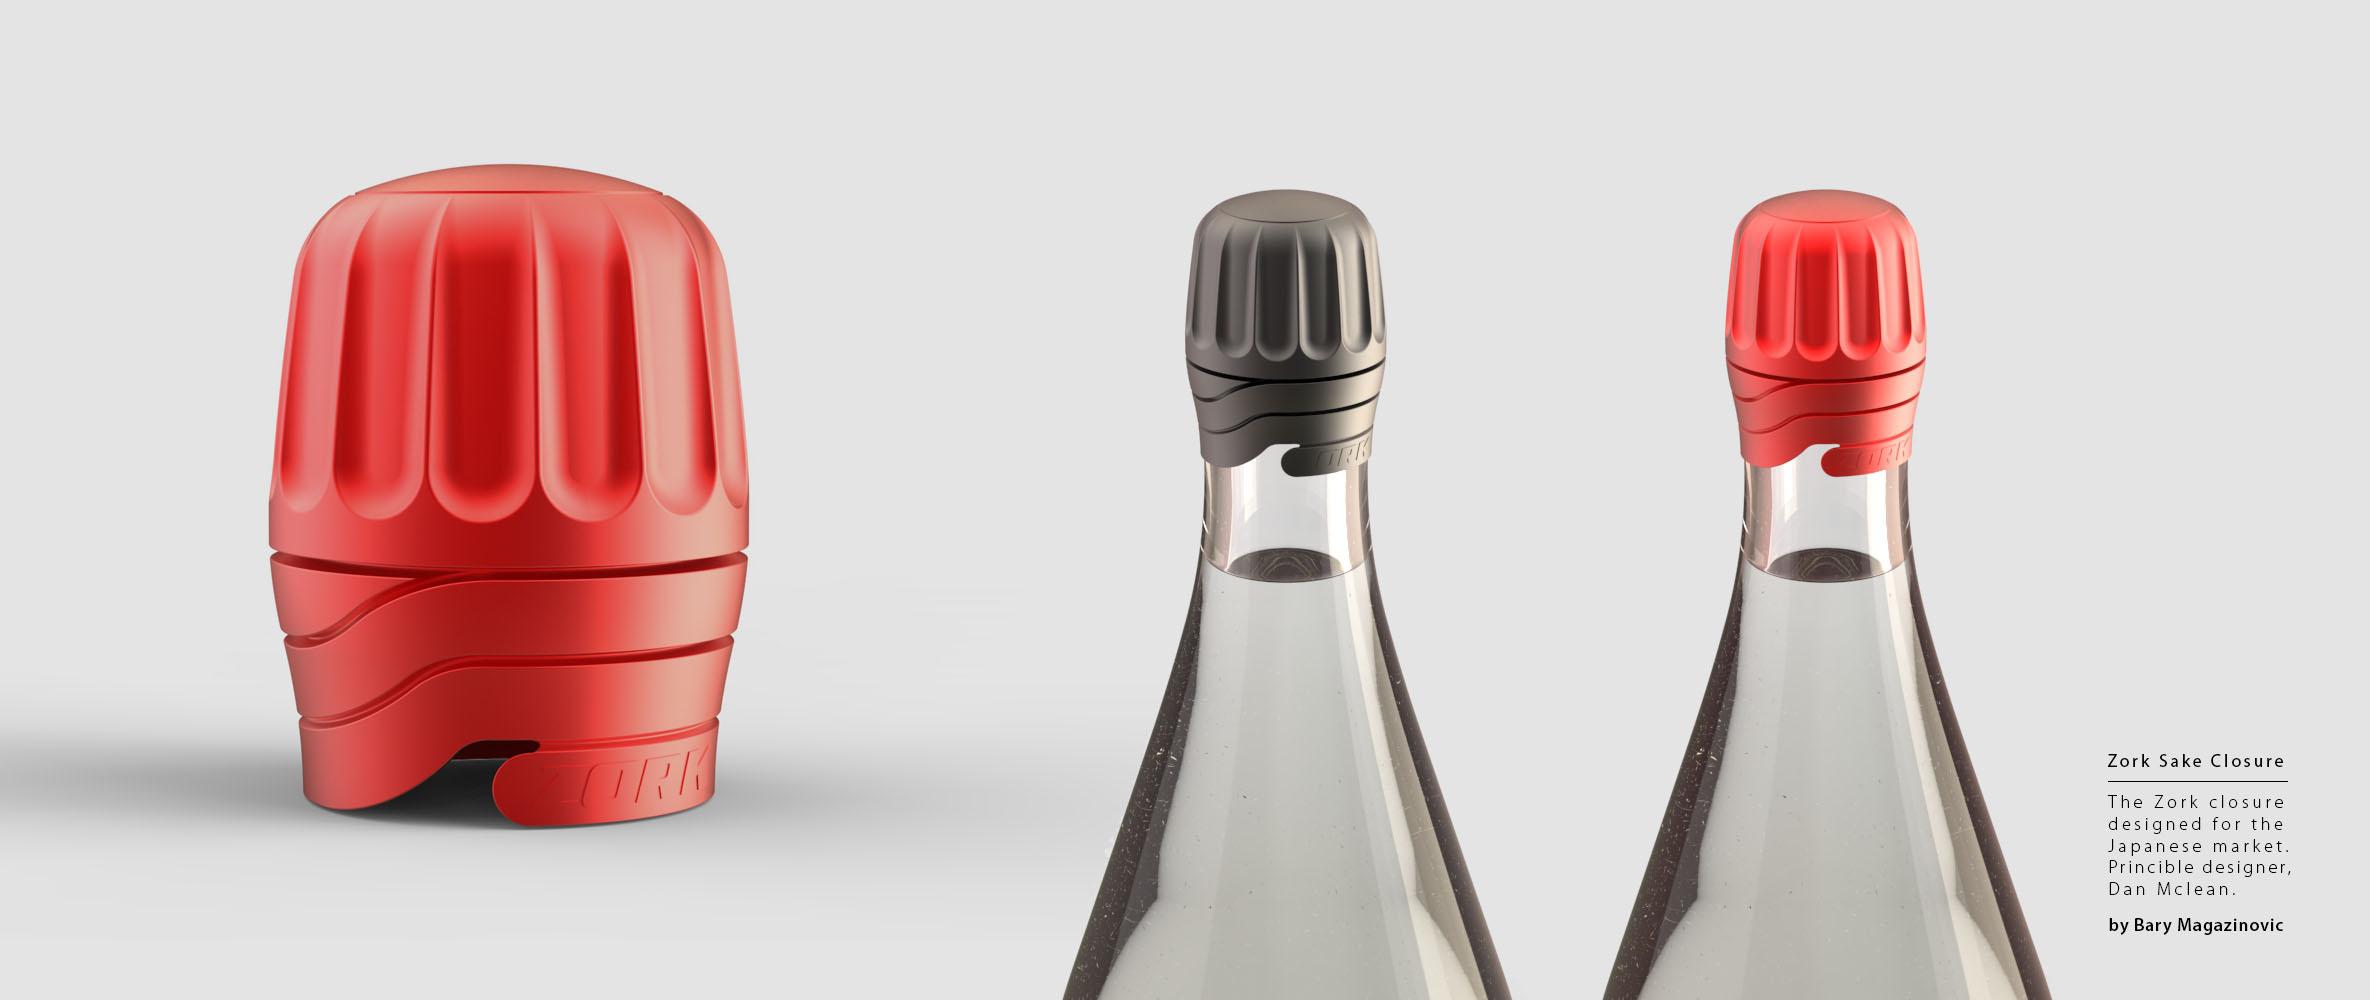 Australian Product Design Industrial Design Sake Japanese by Barry Magazinovic